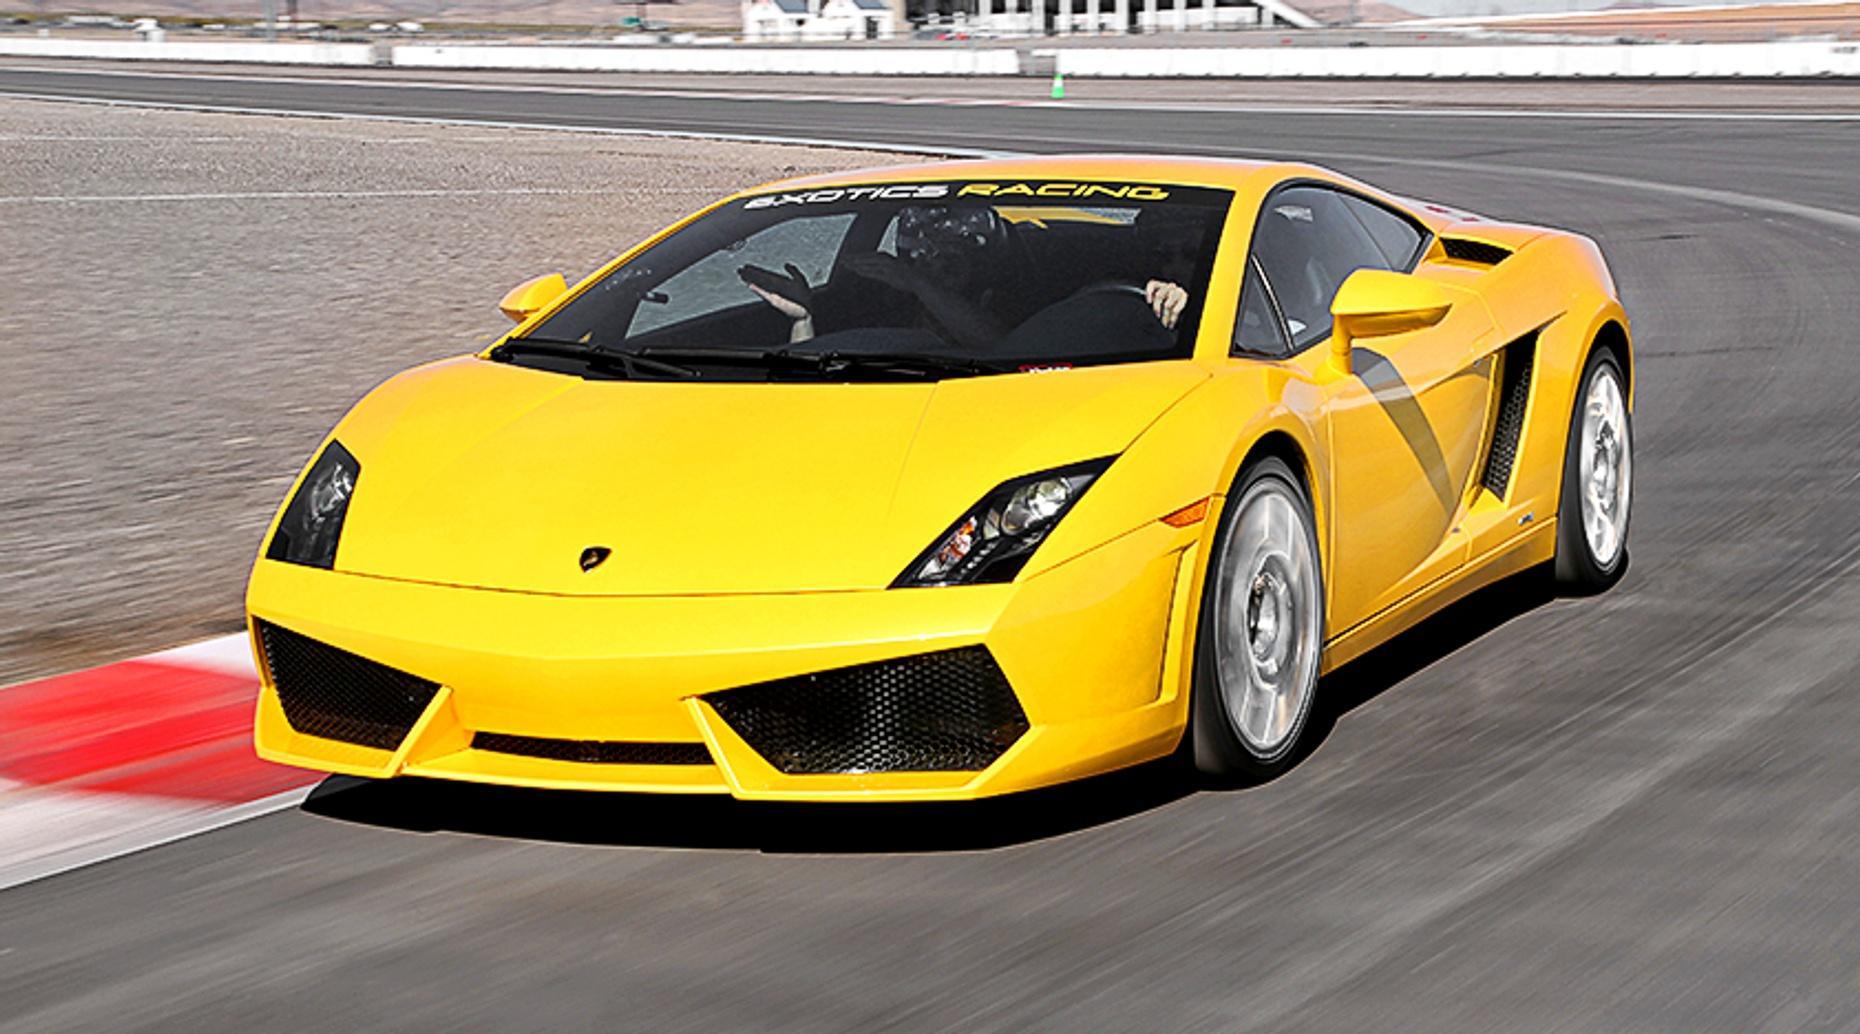 Las Vegas Race Car Driver Experience with a Lamborghini